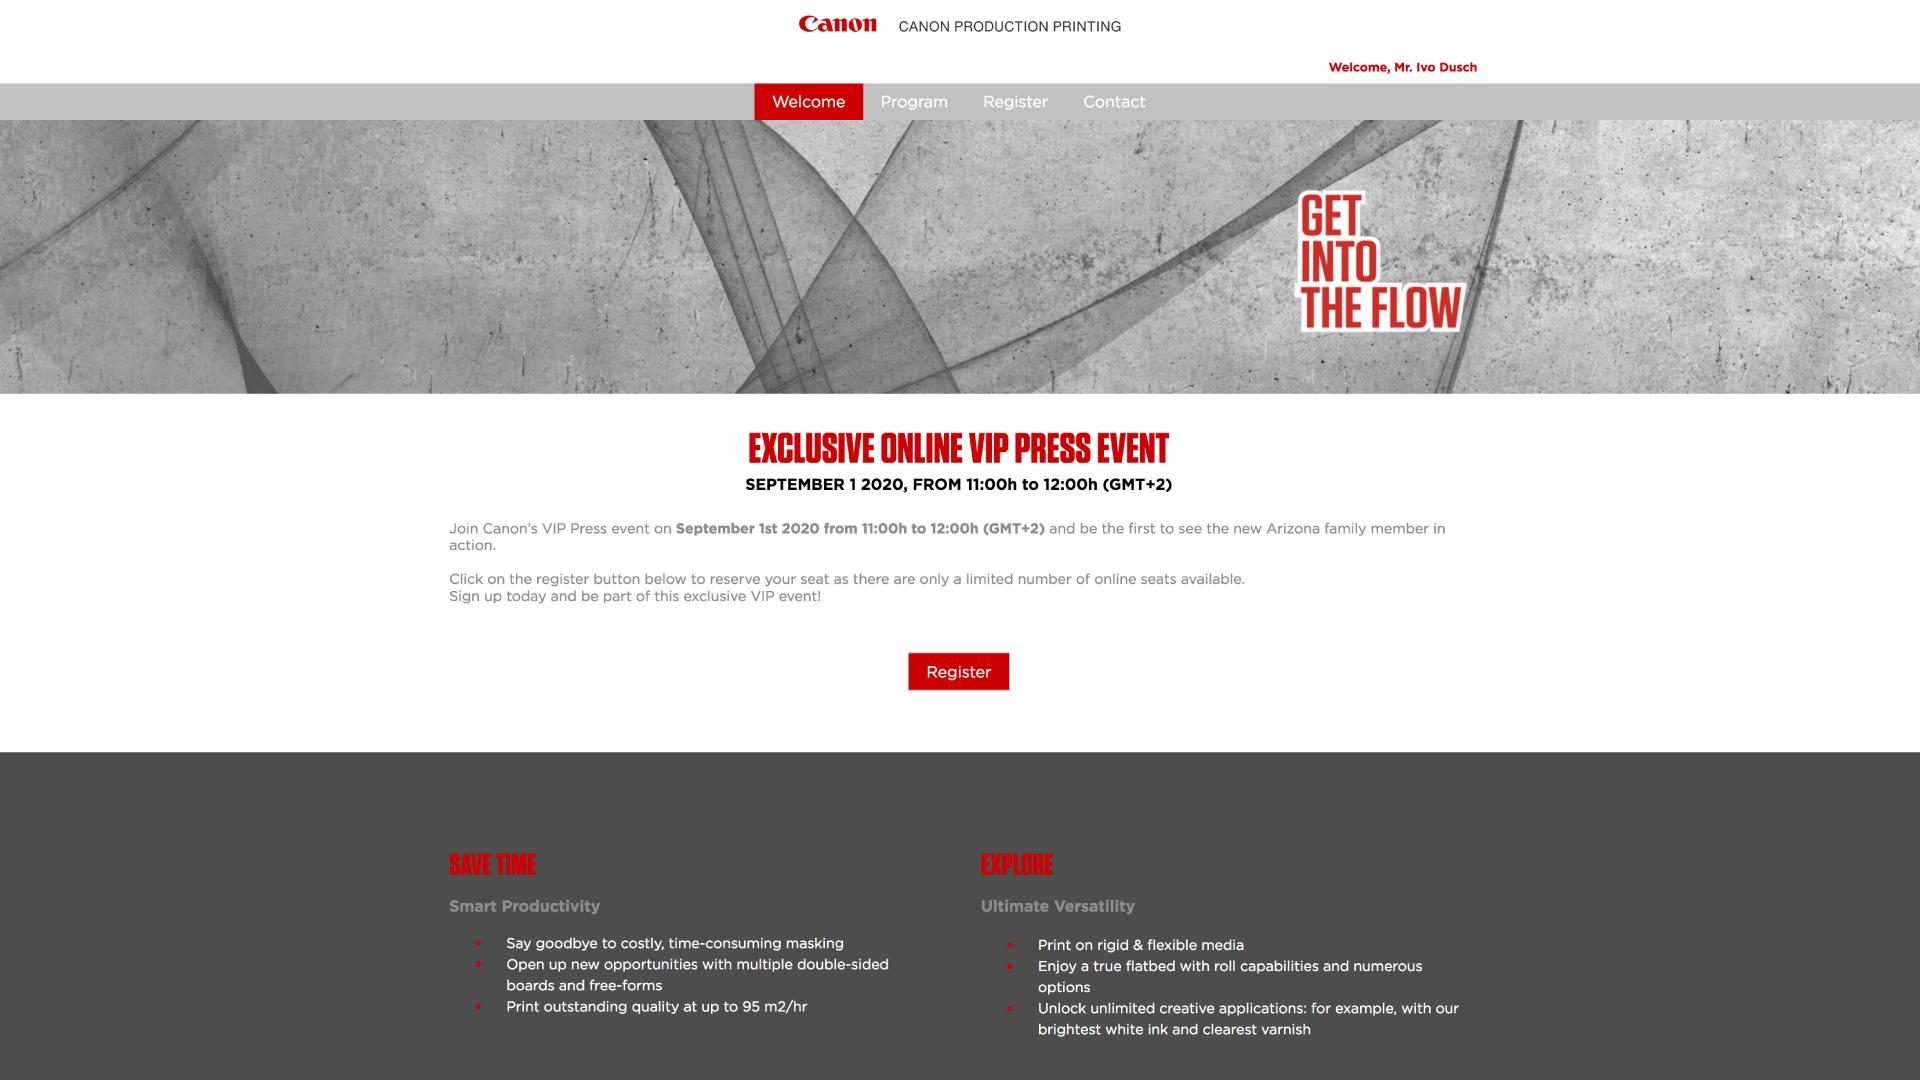 Crossmedia campaign